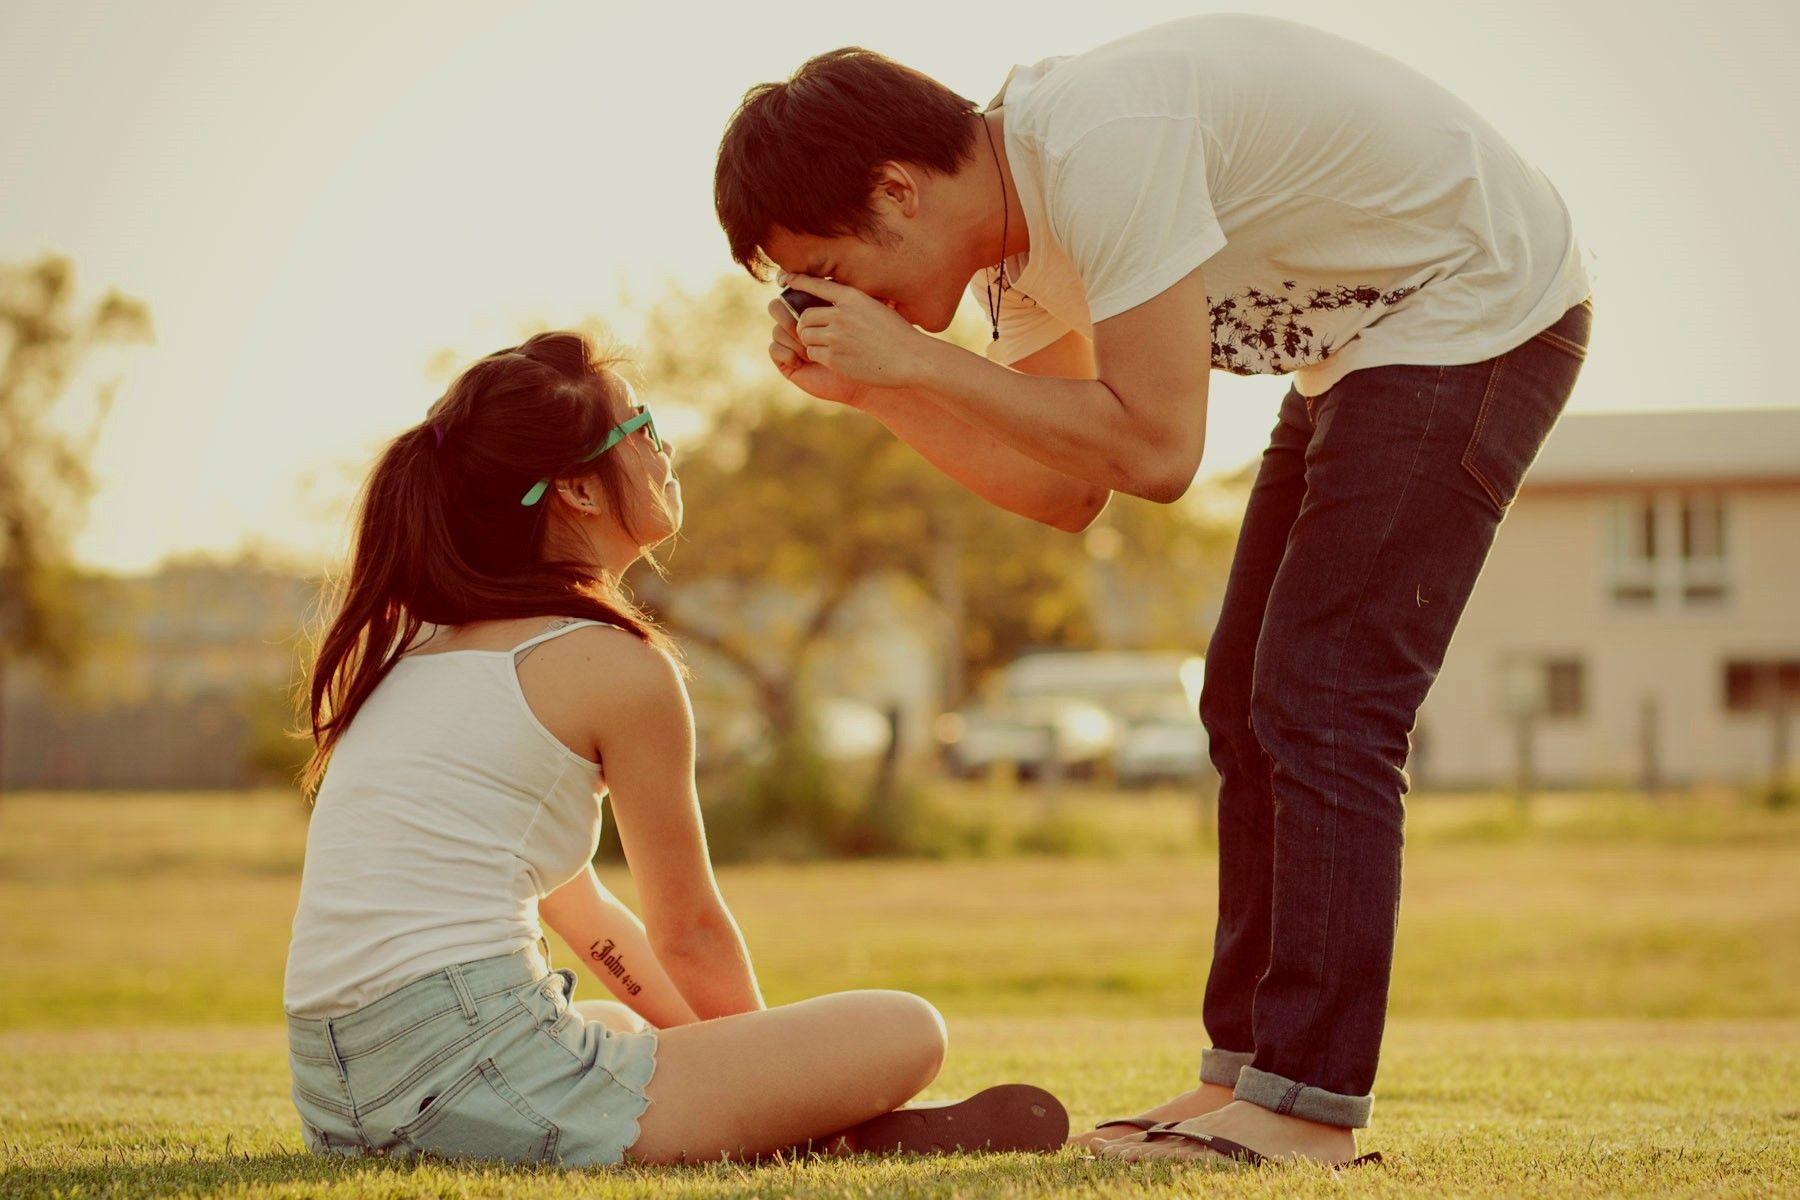 Картинка парня с девушкой на руках